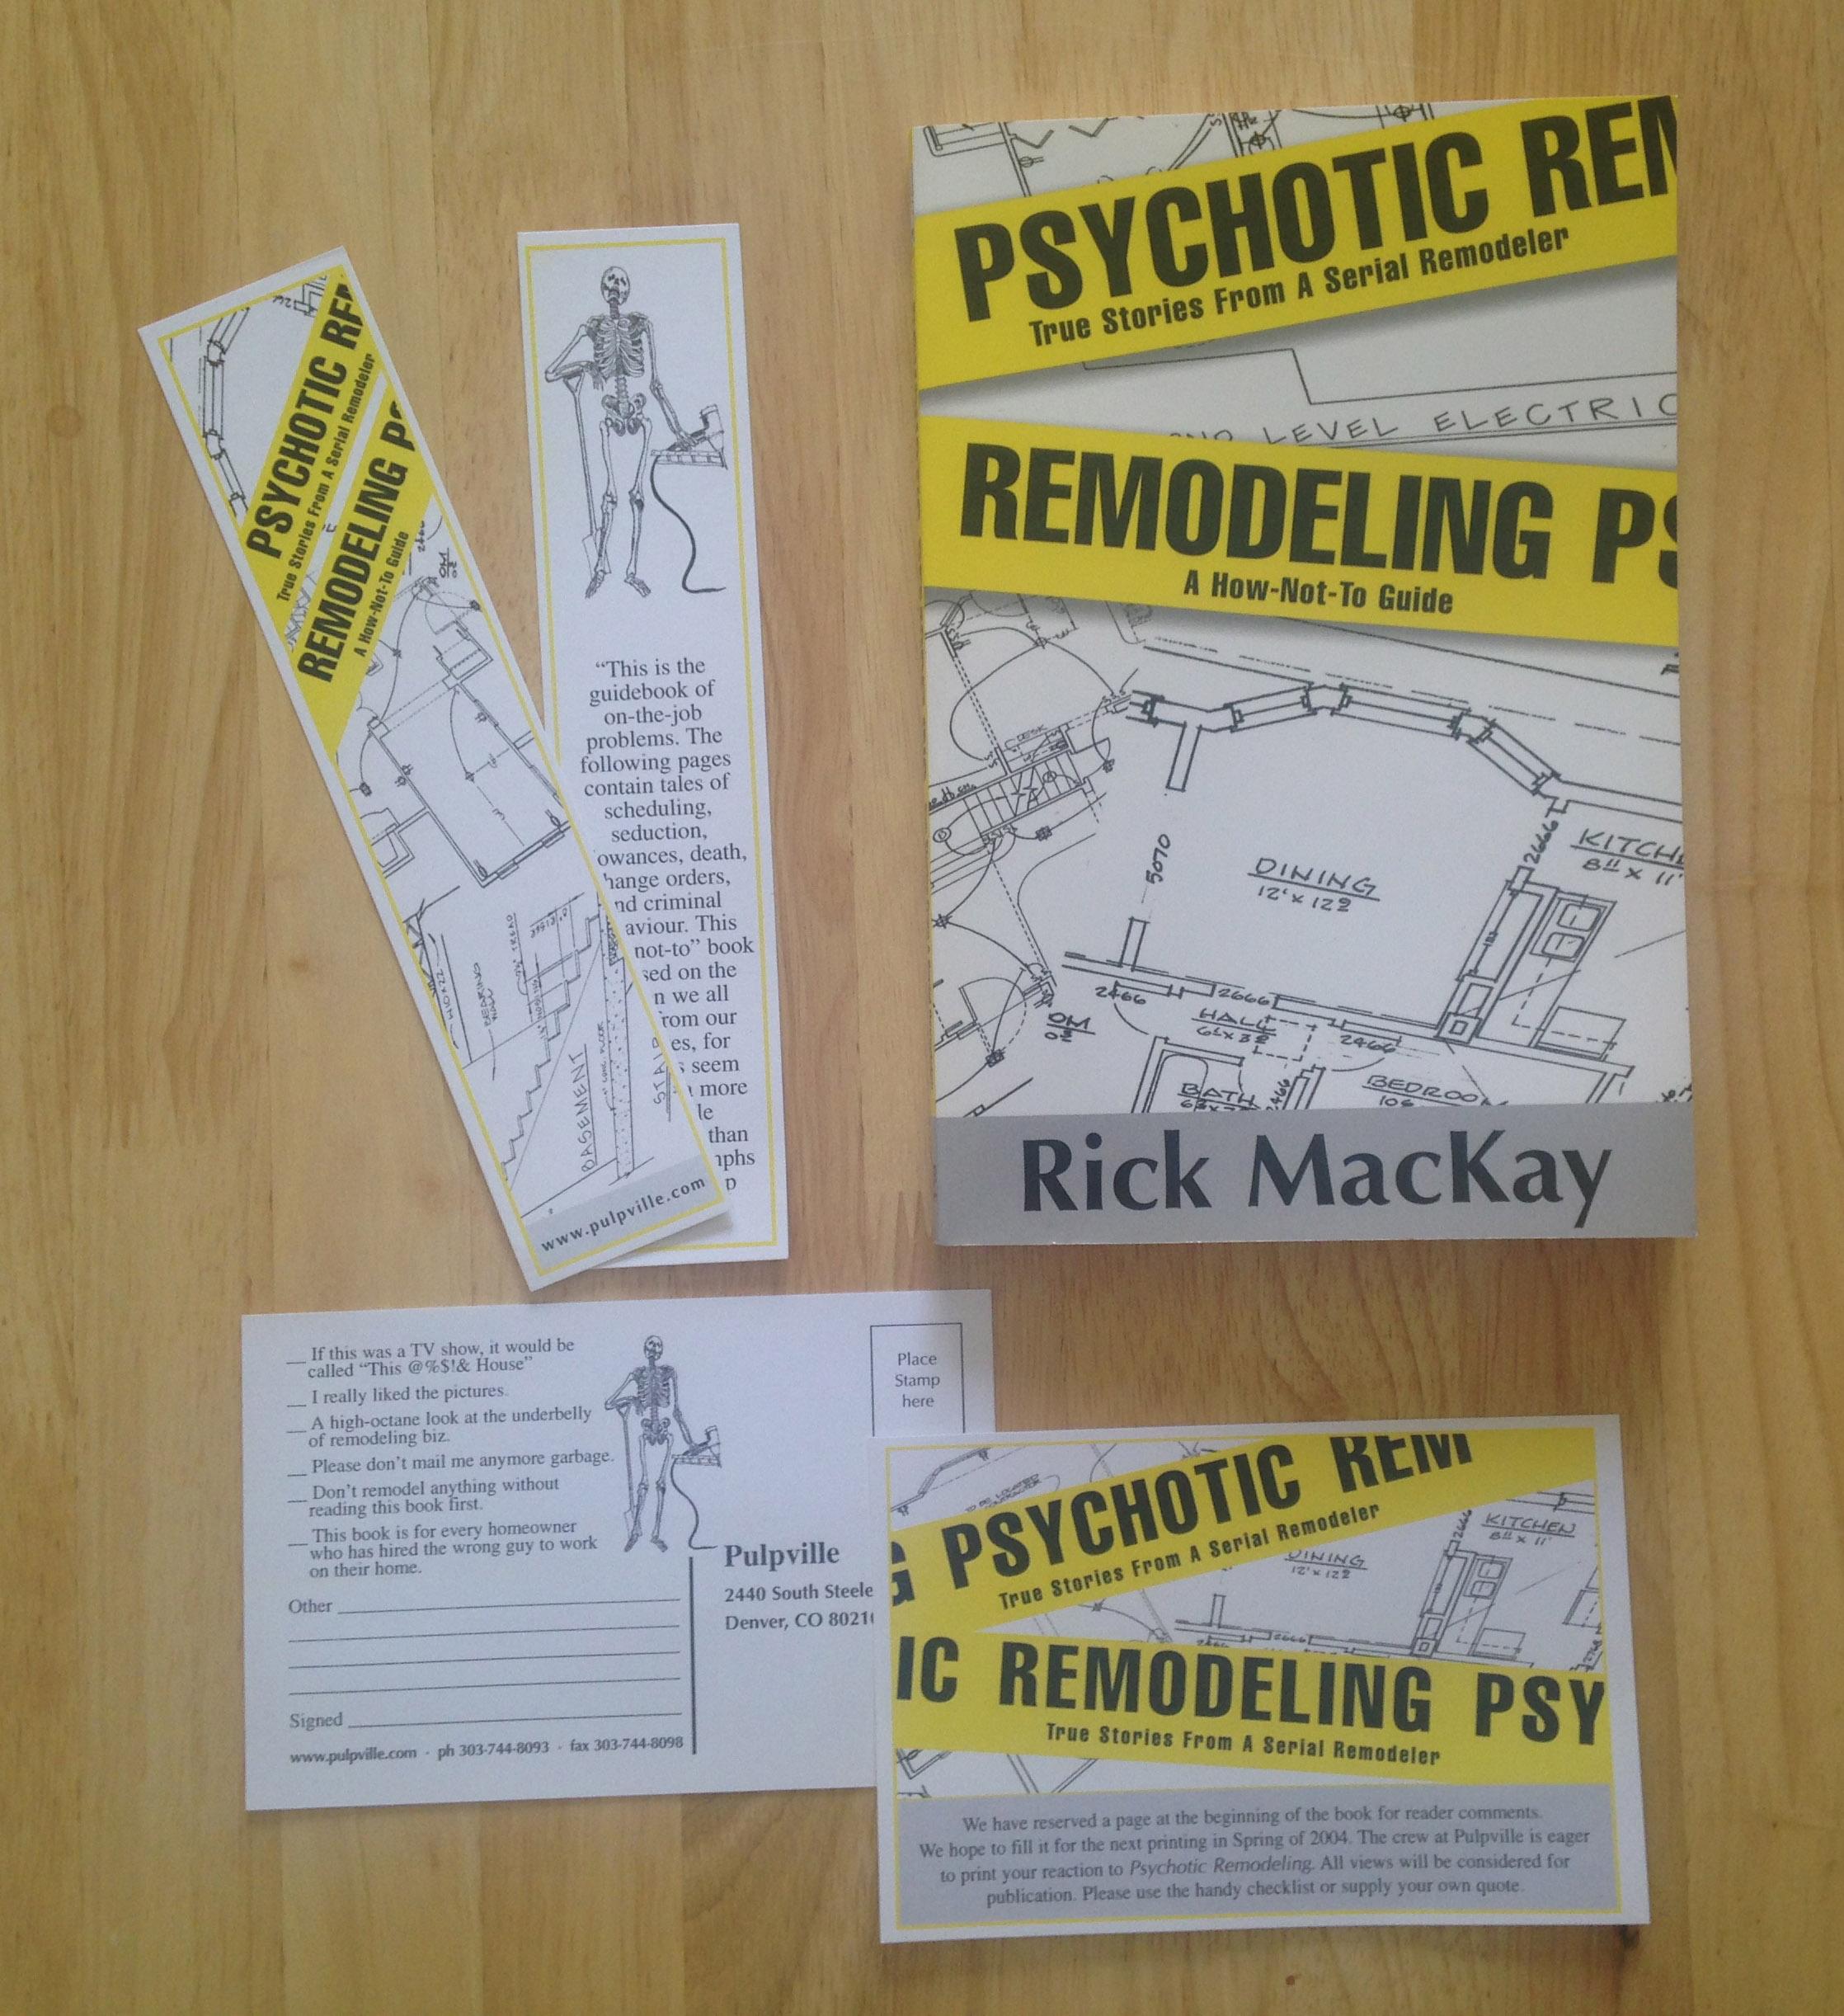 Psychotic Remodeling